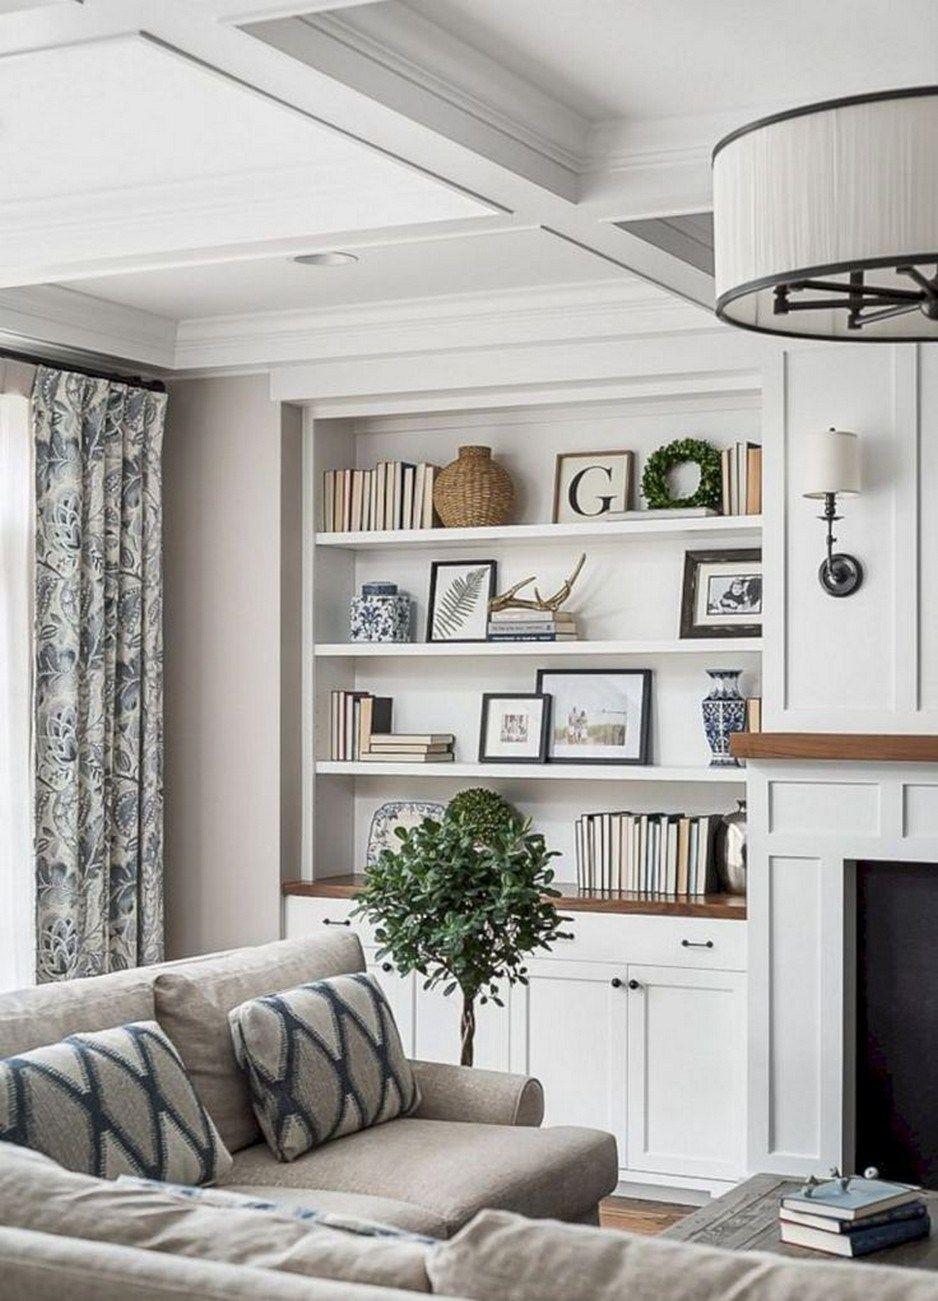 ✔82 wonderful modern farmhouse living room decor ideas 17 #modernfarmhouselivingroom